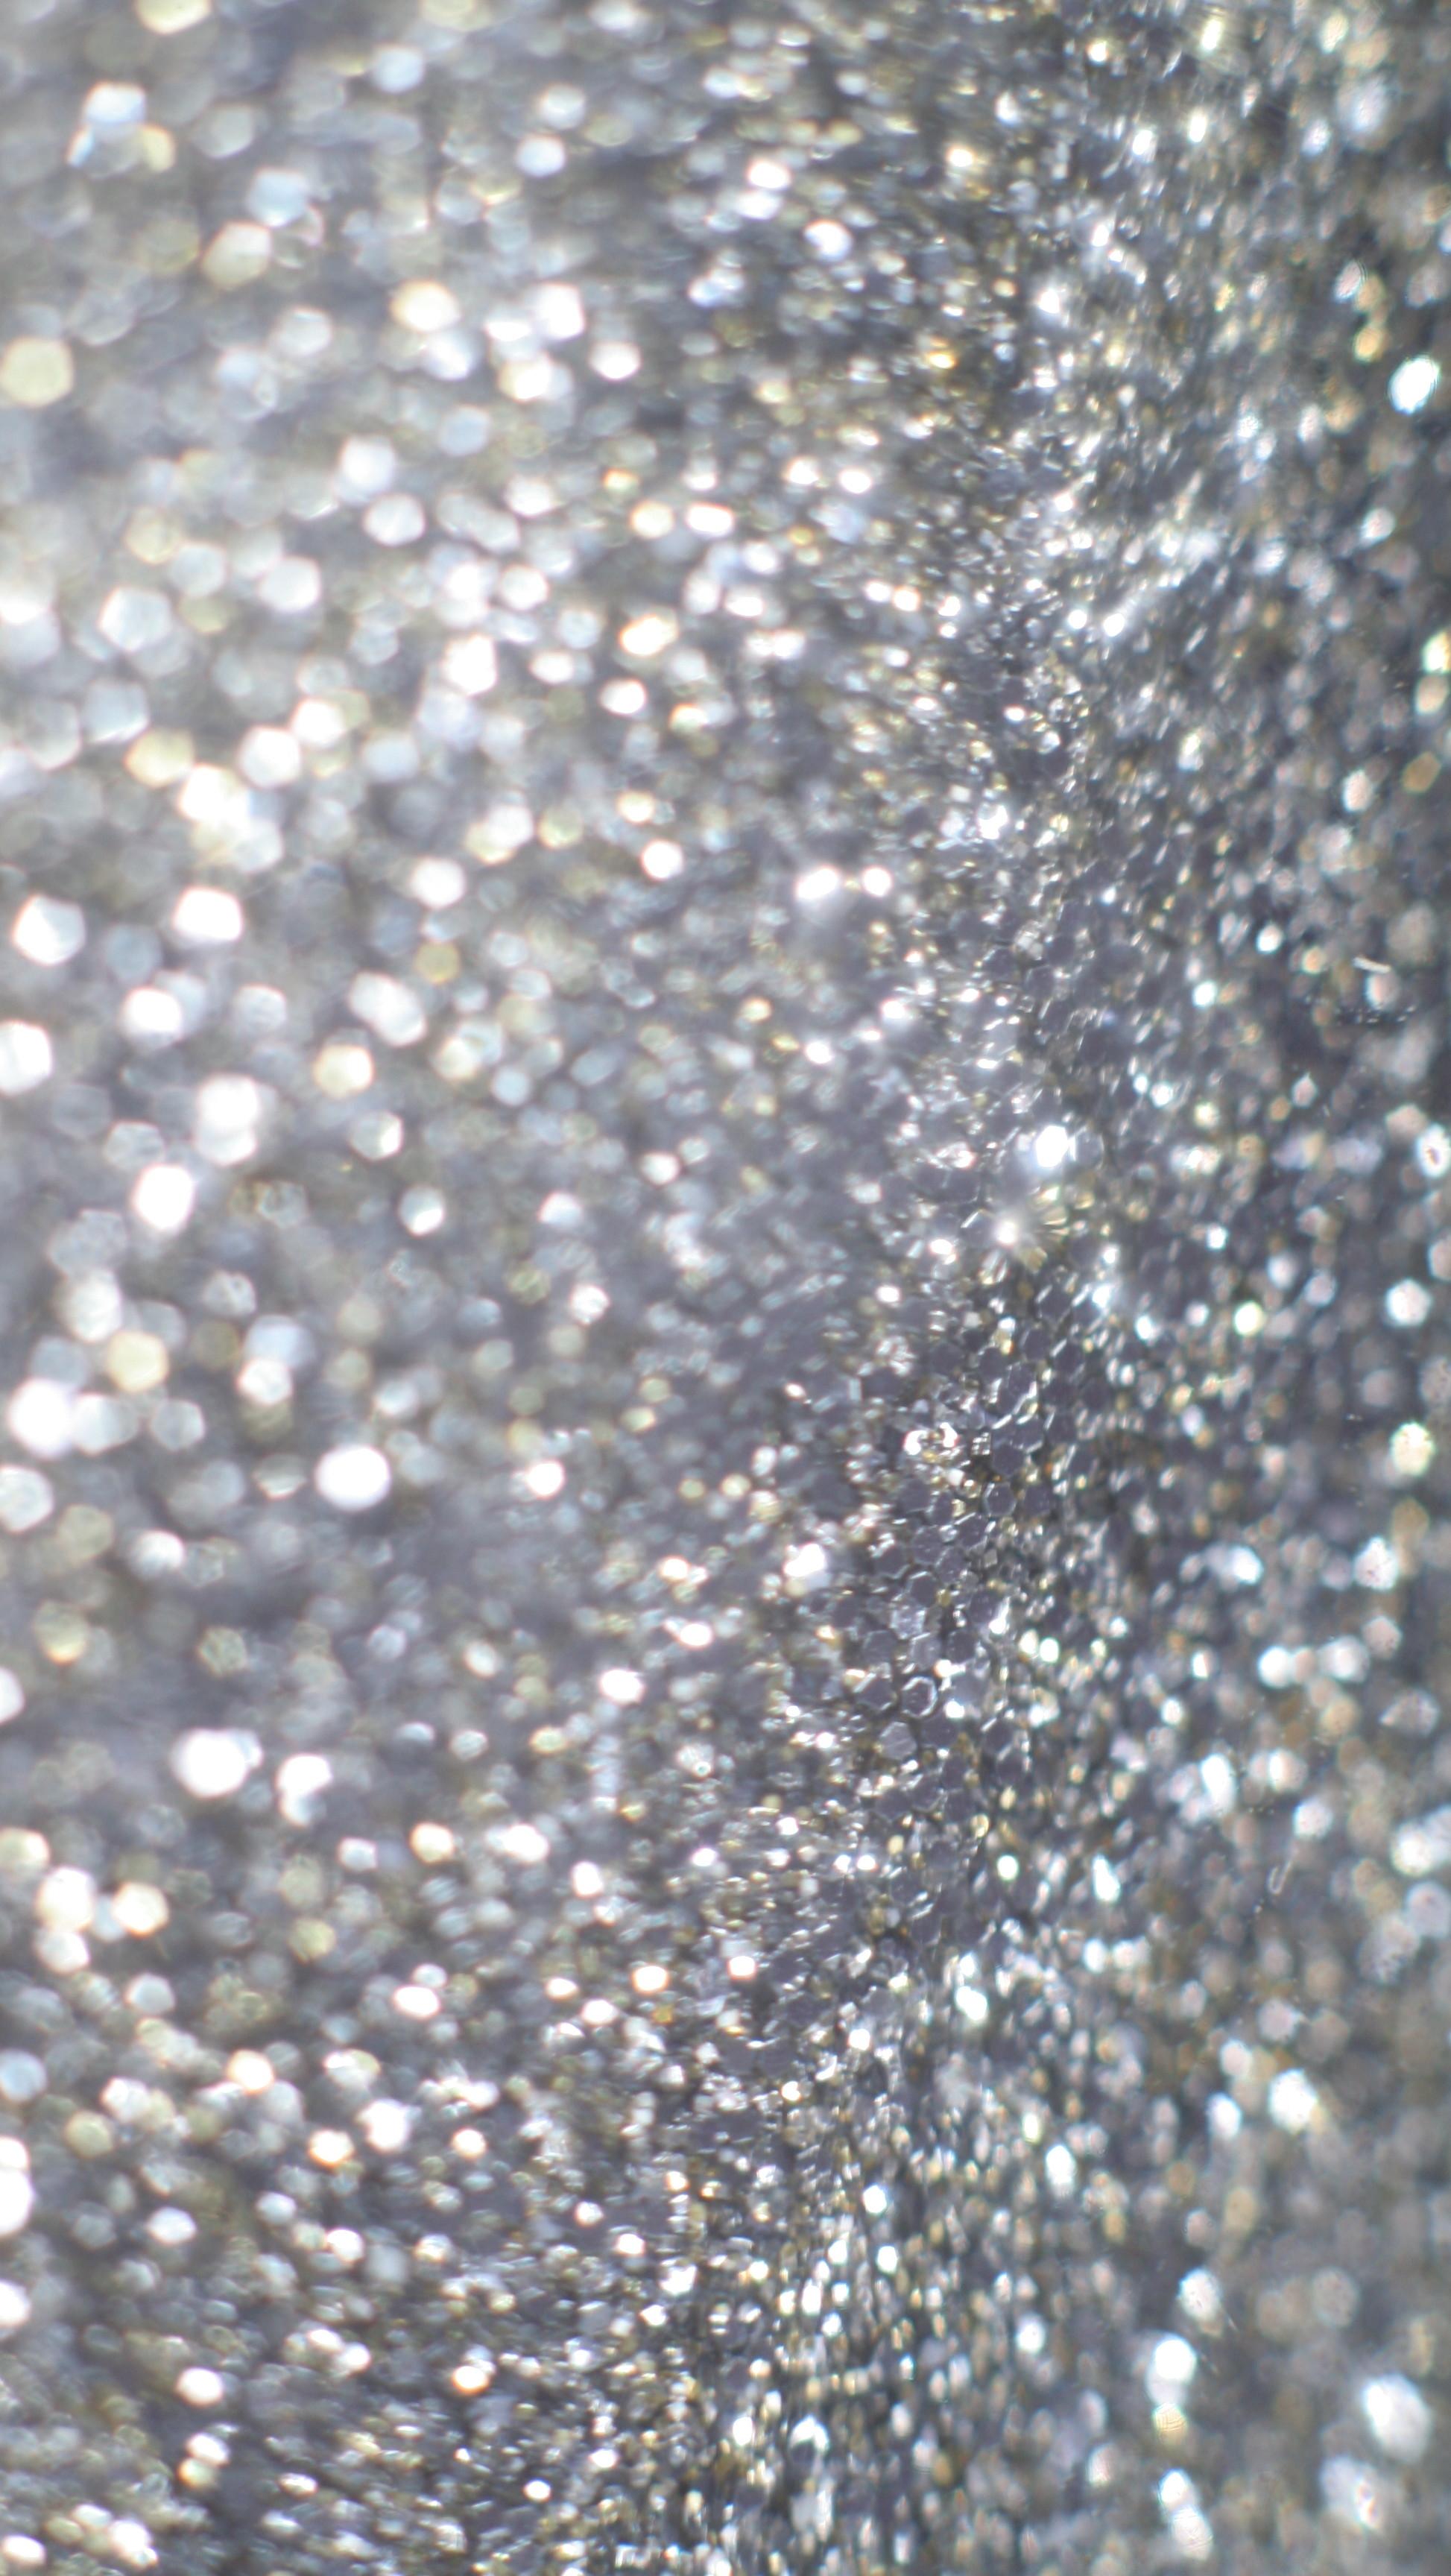 Silver glitter iphone phone wallpaper background lock screen